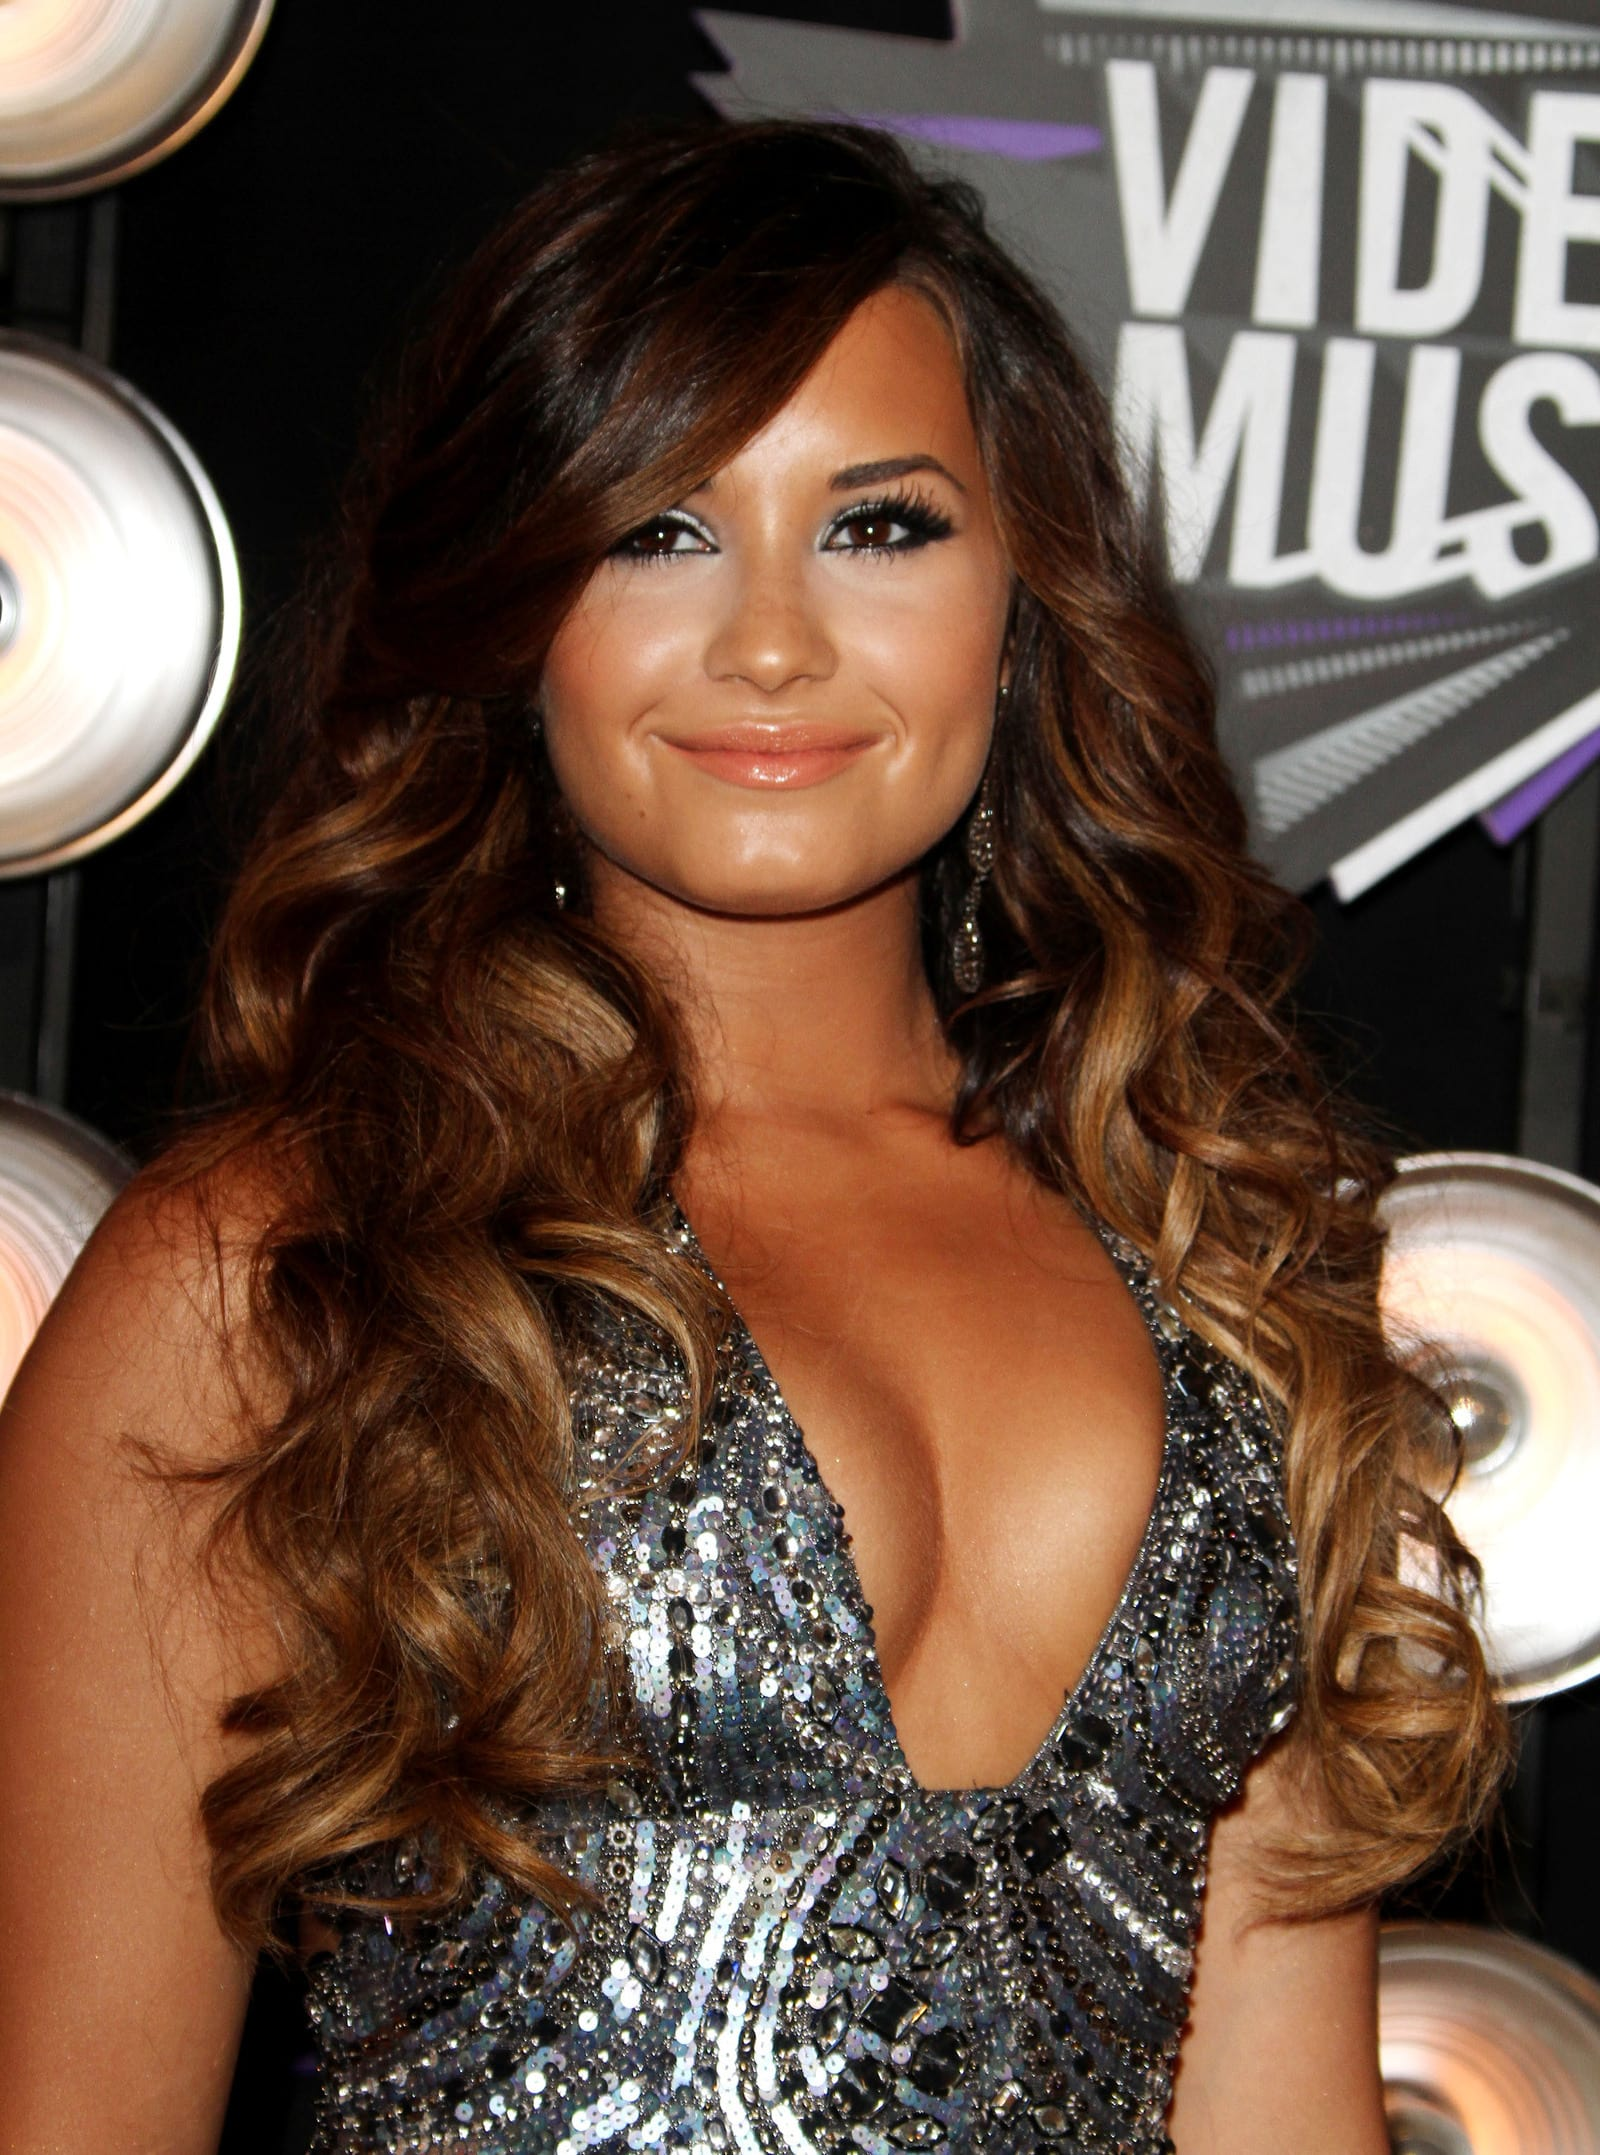 Hot Demetria Lovato nude (43 photos), Topless, Leaked, Boobs, braless 2019